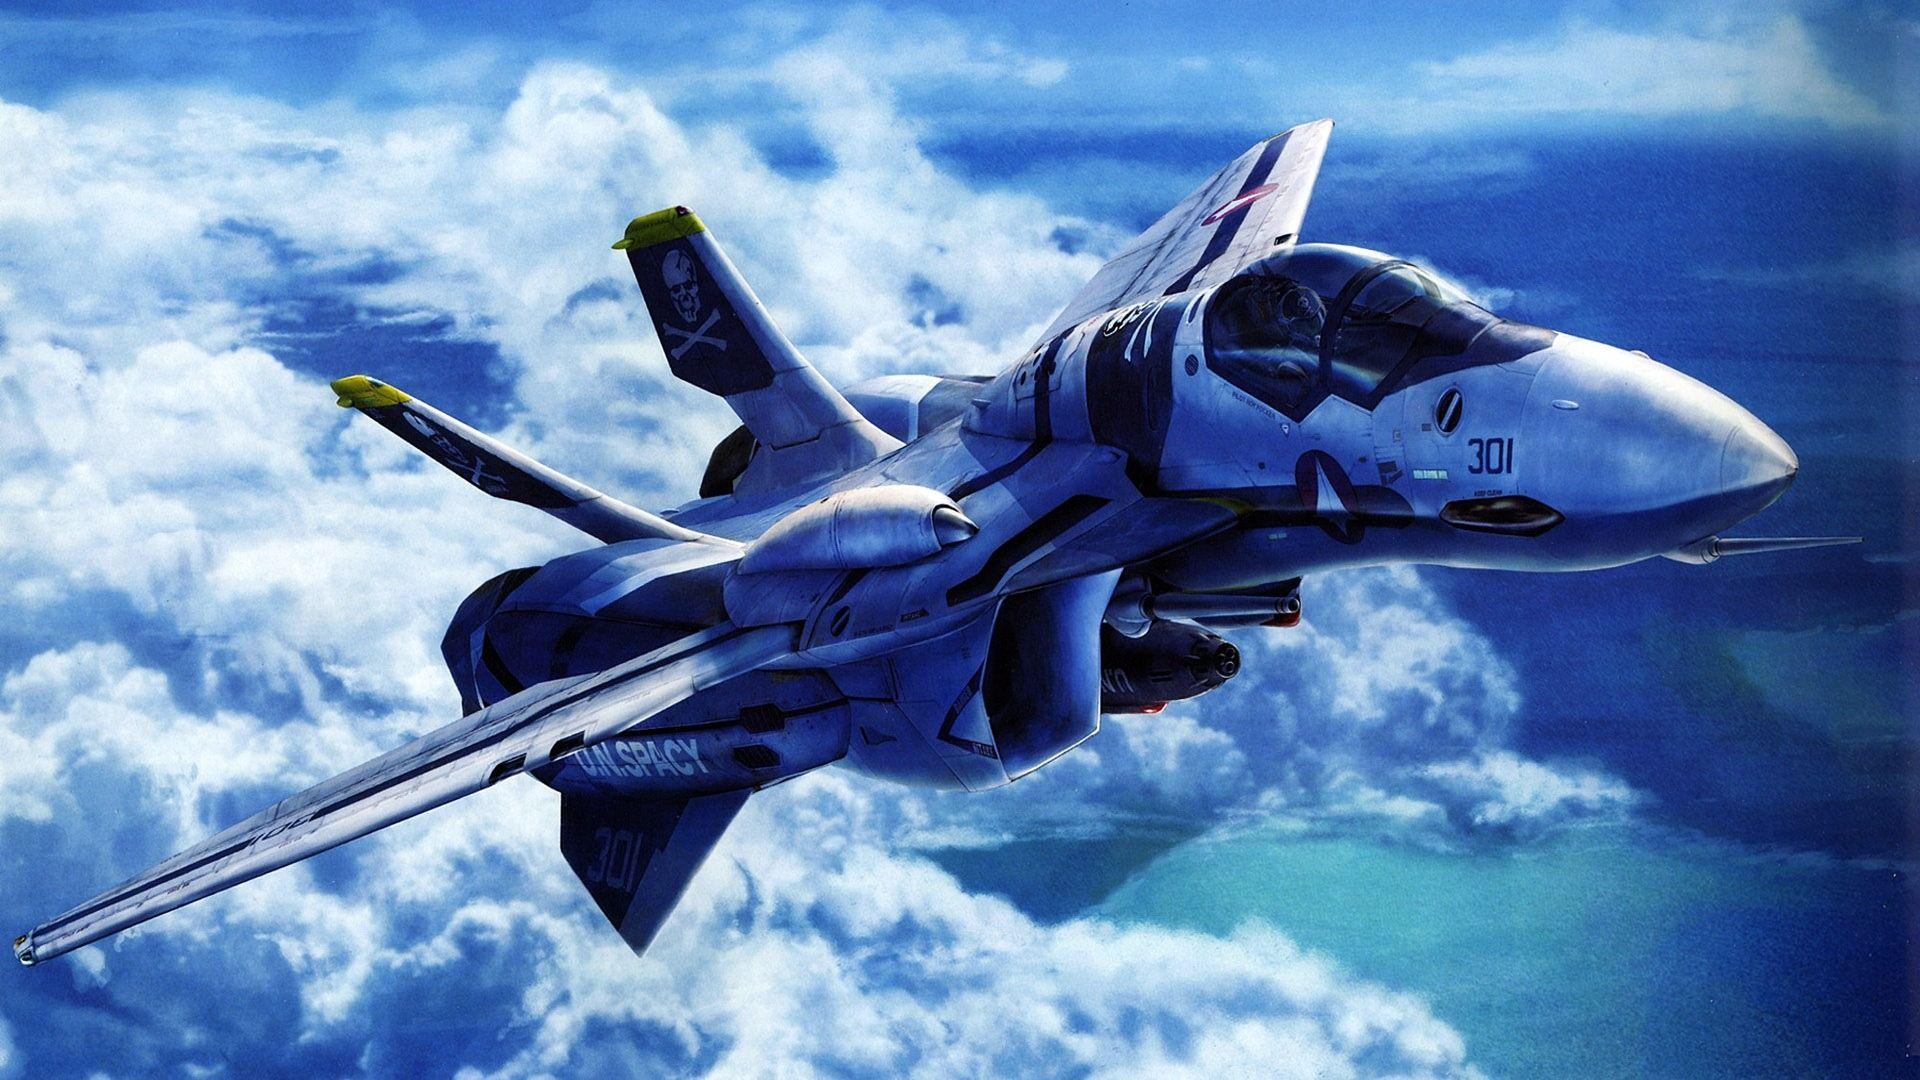 jet fighters wallpaper